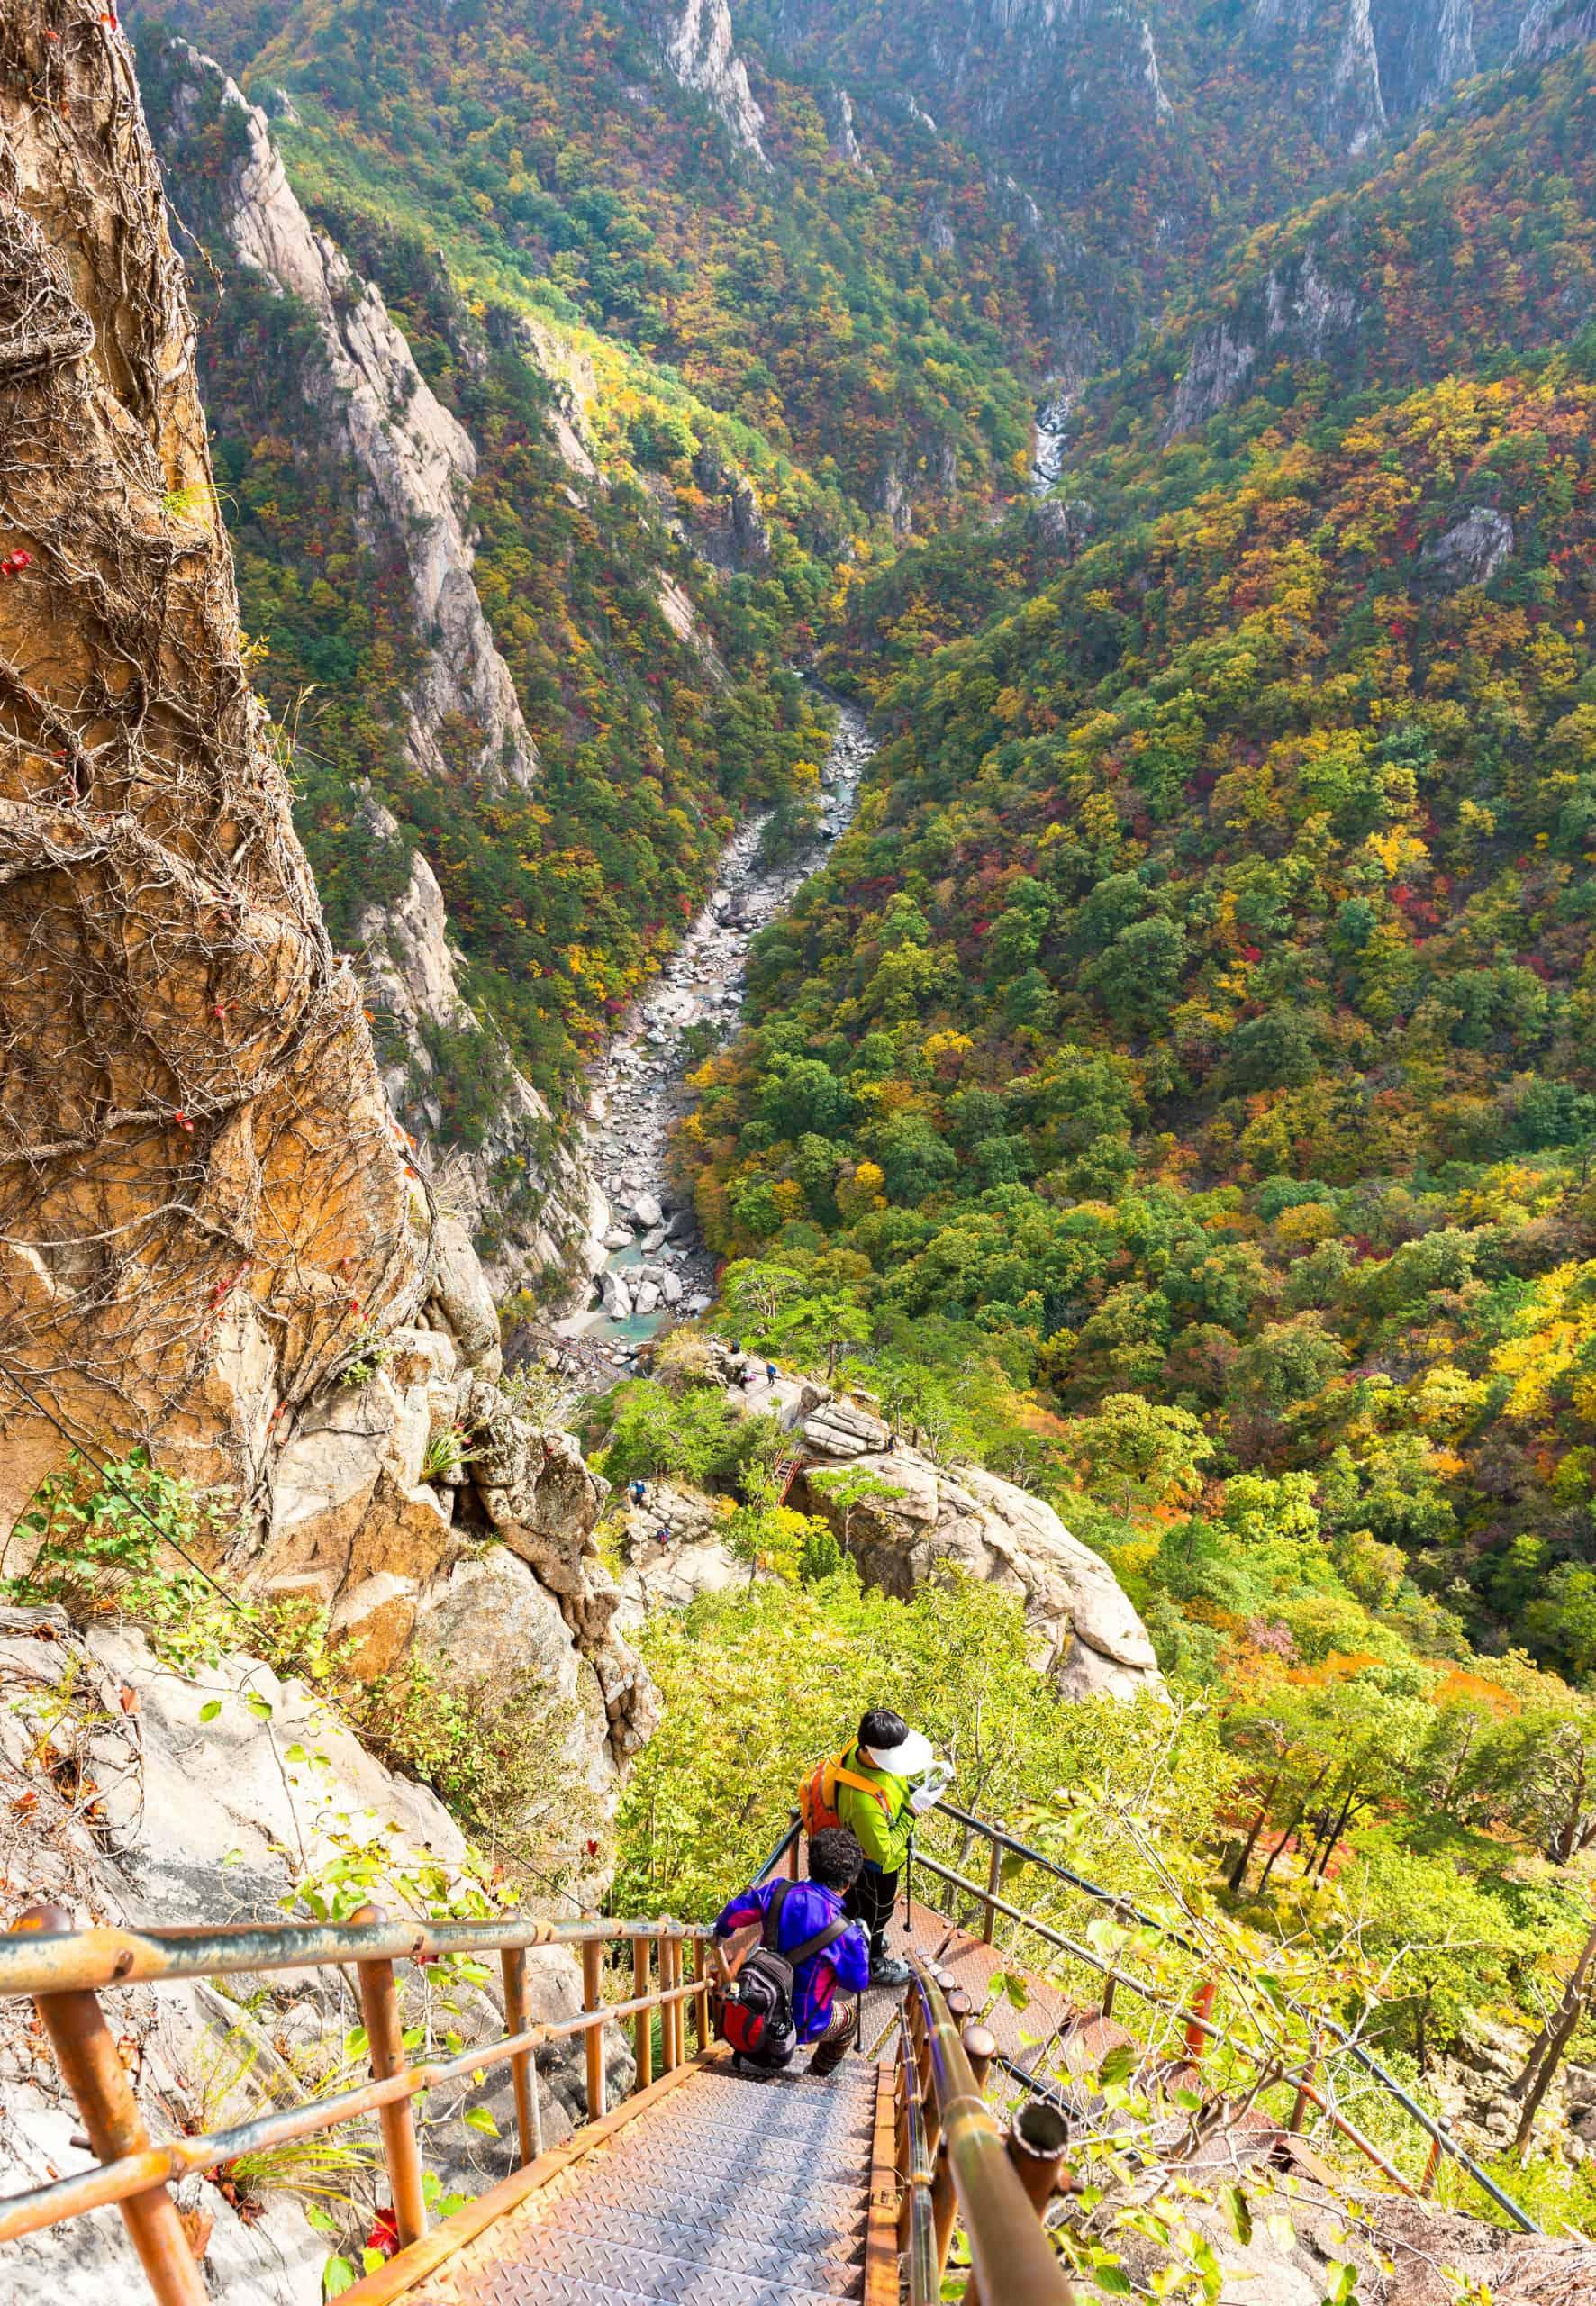 Korean tourists in the Seoraksan National Park, South korea